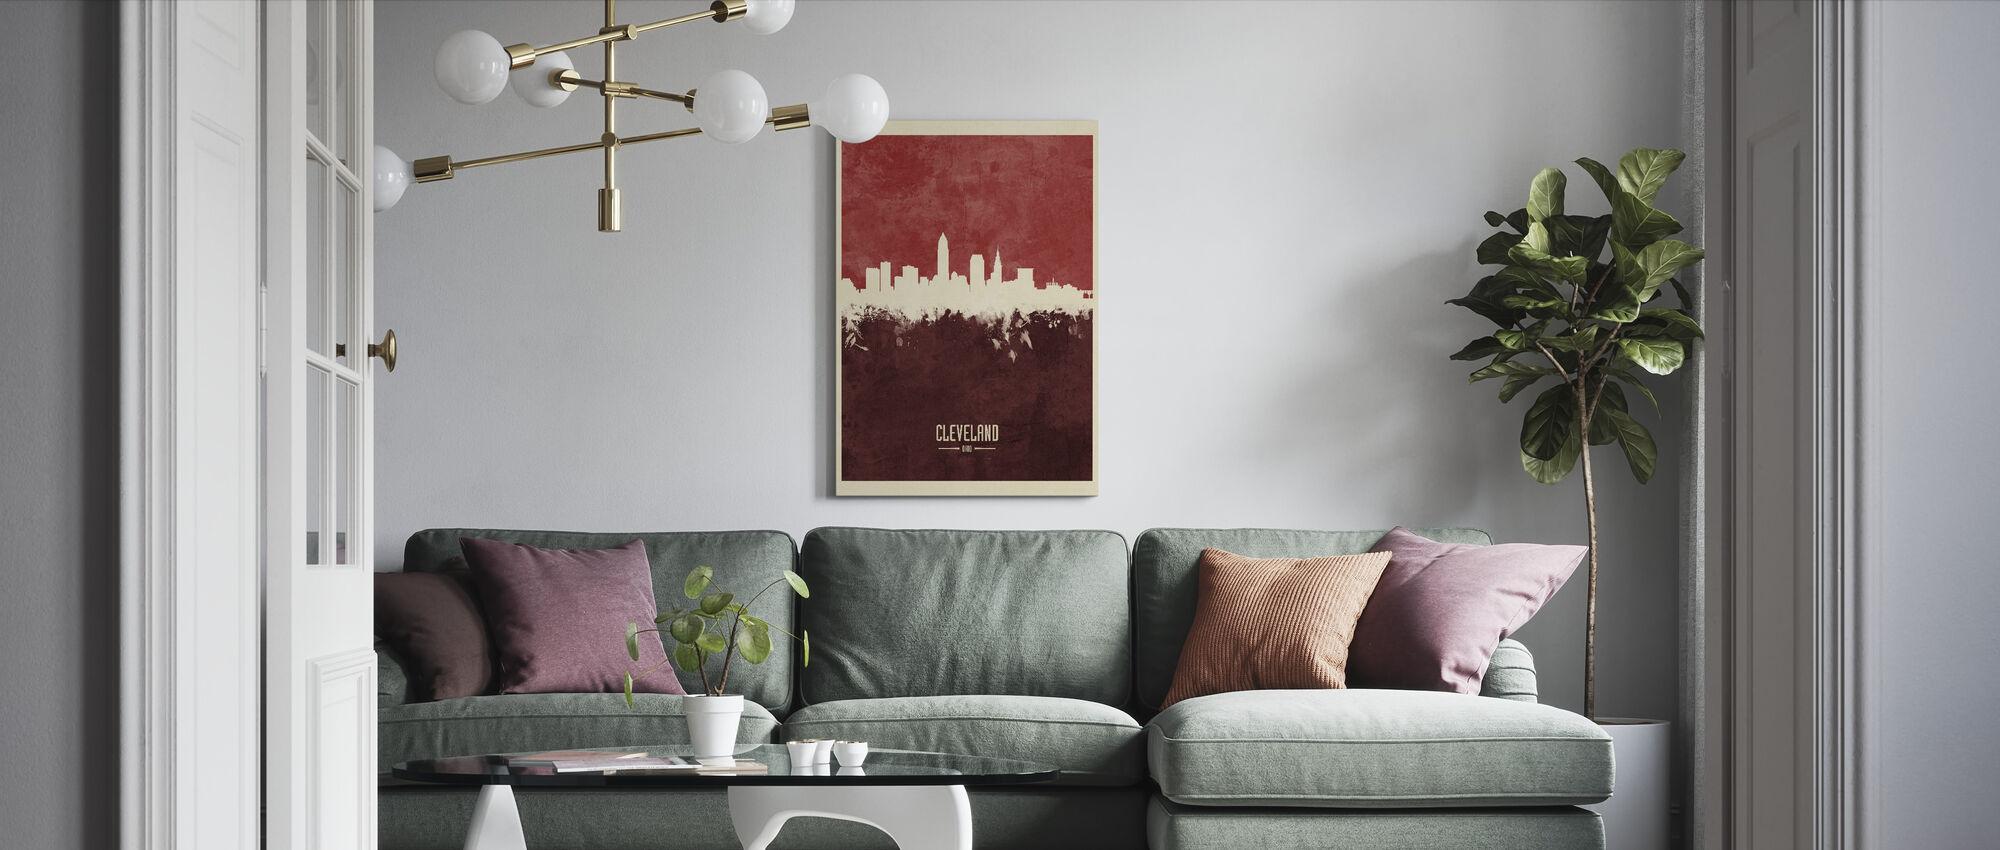 Cleveland Ohio Skyline Rood - Canvas print - Woonkamer